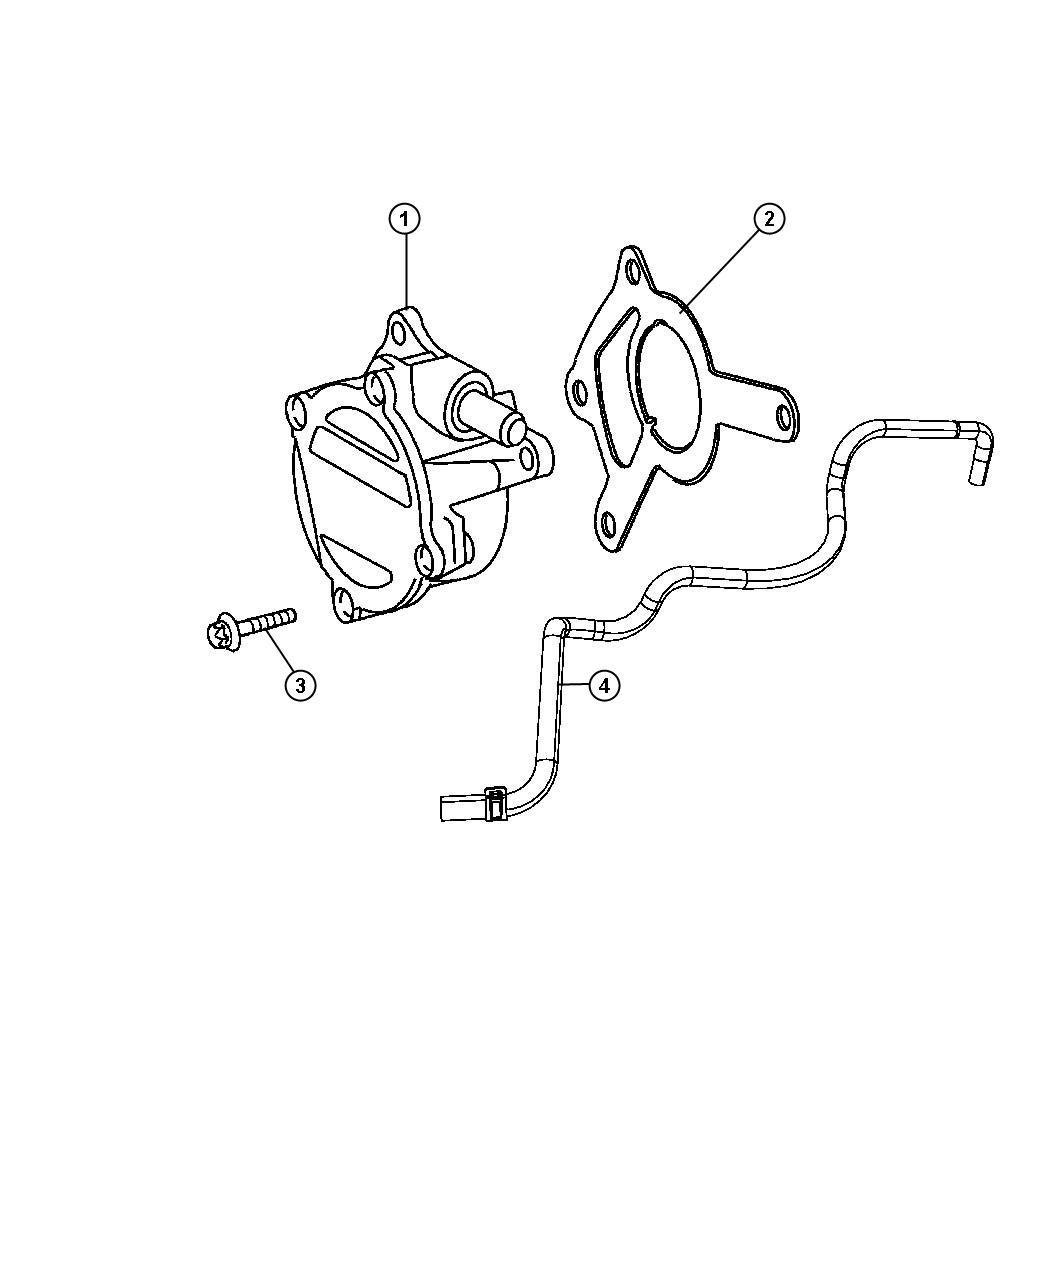 Jeep Grand Cherokee Pump Vacuumsel Turbo Engines